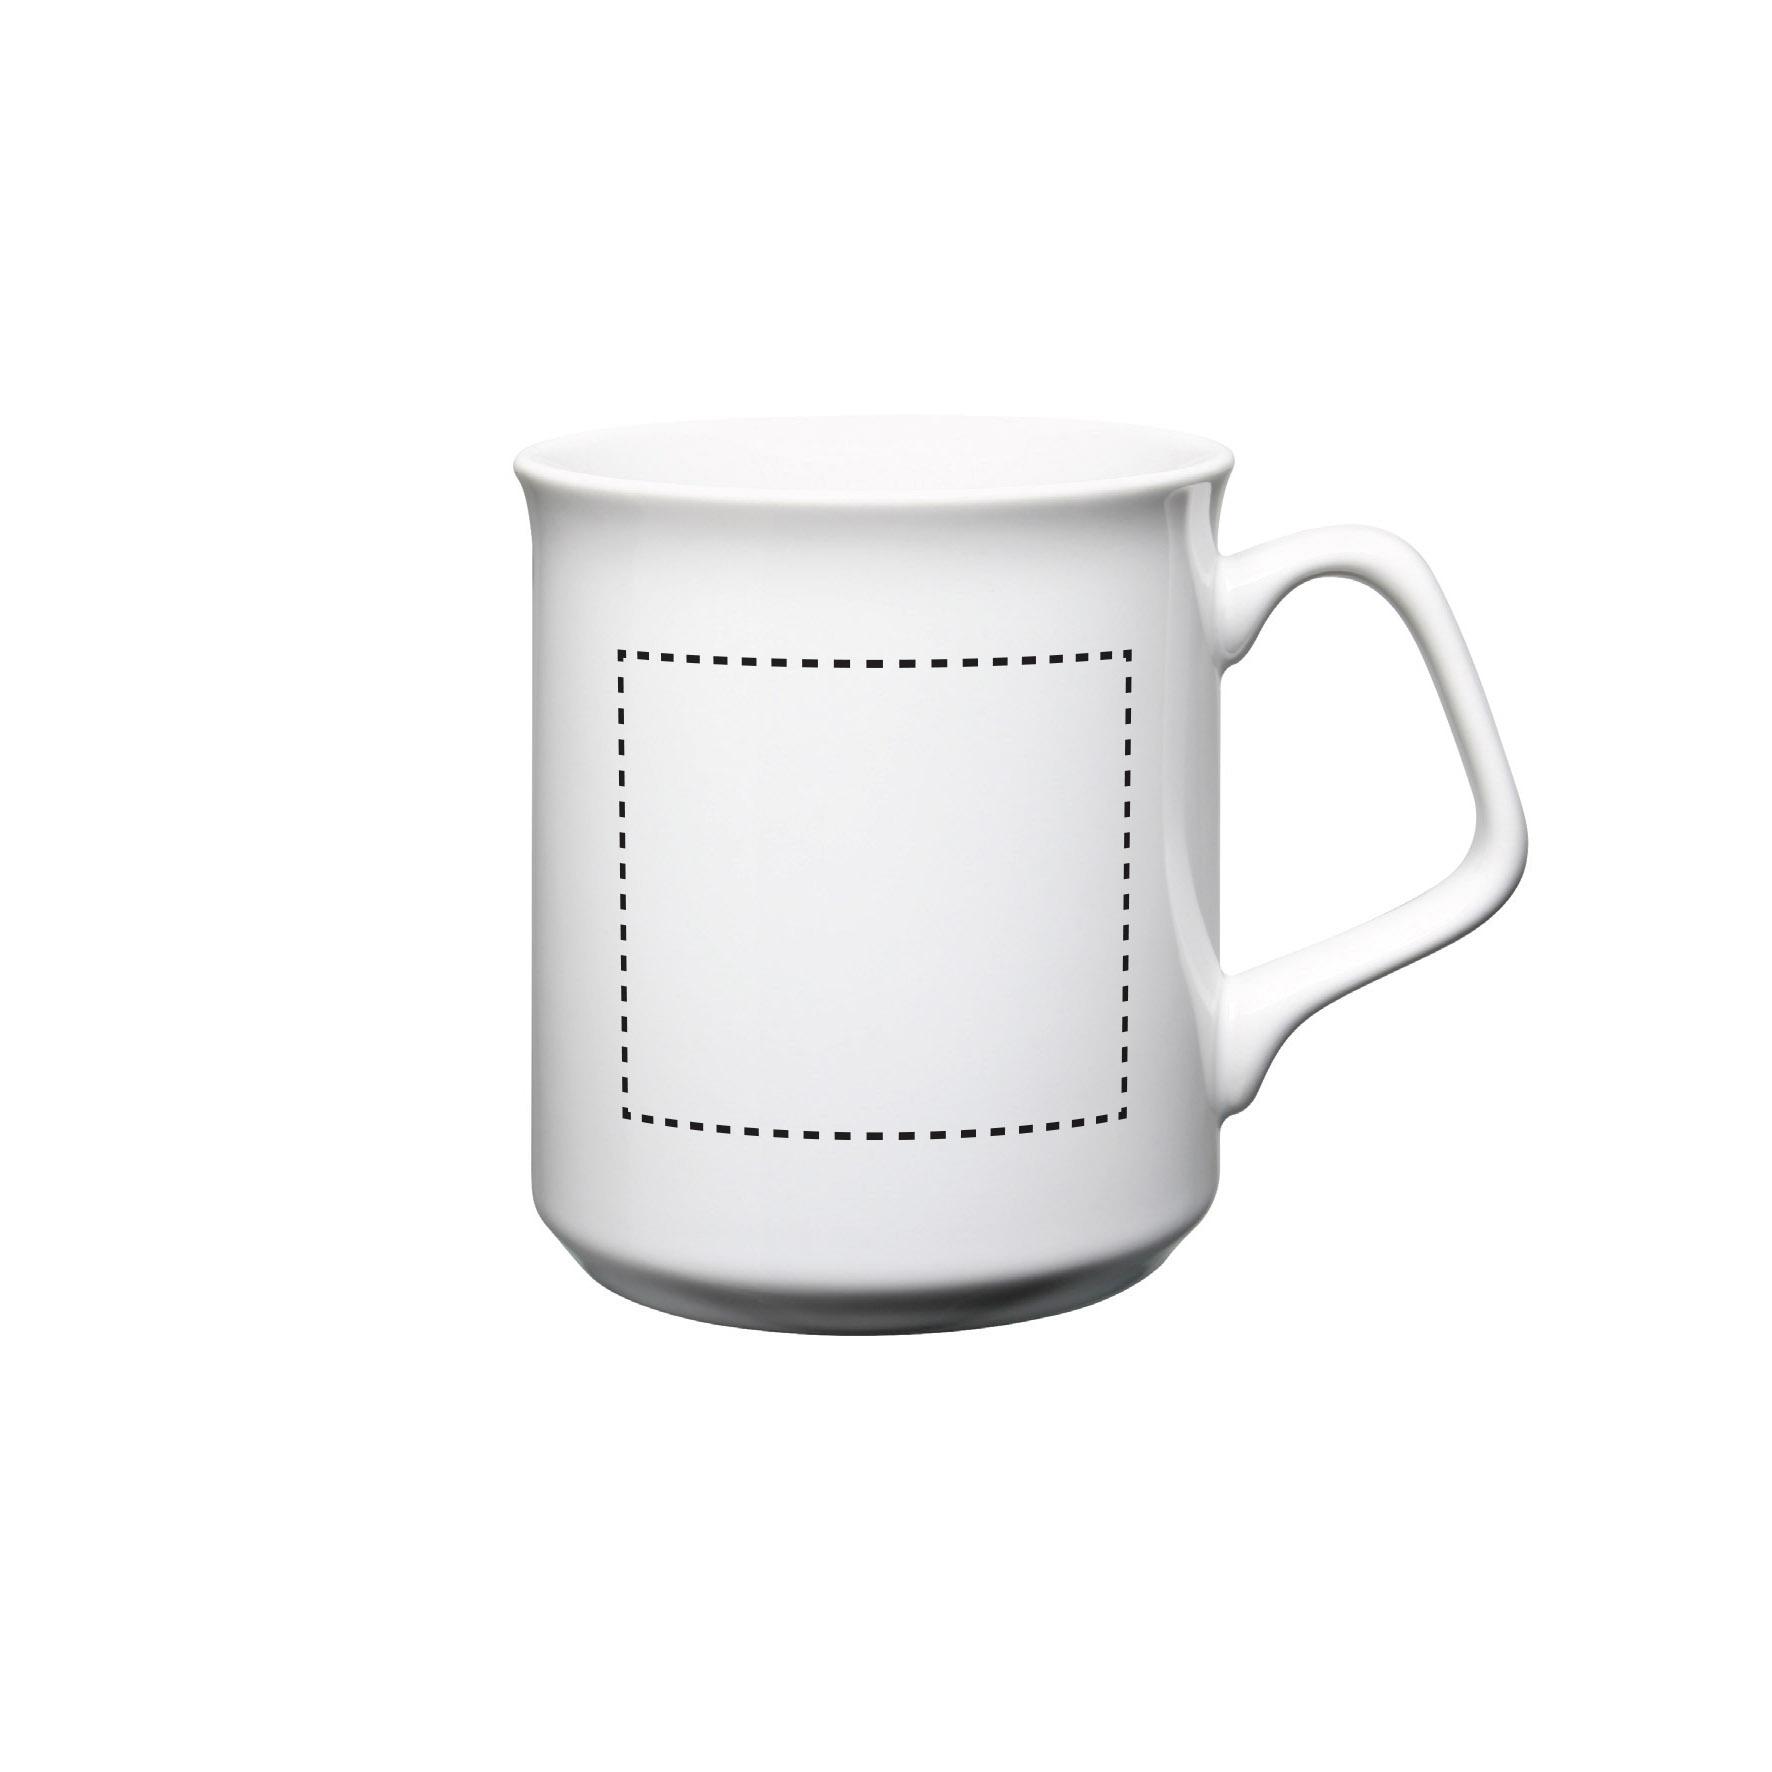 Budget Buster Sparta Mug